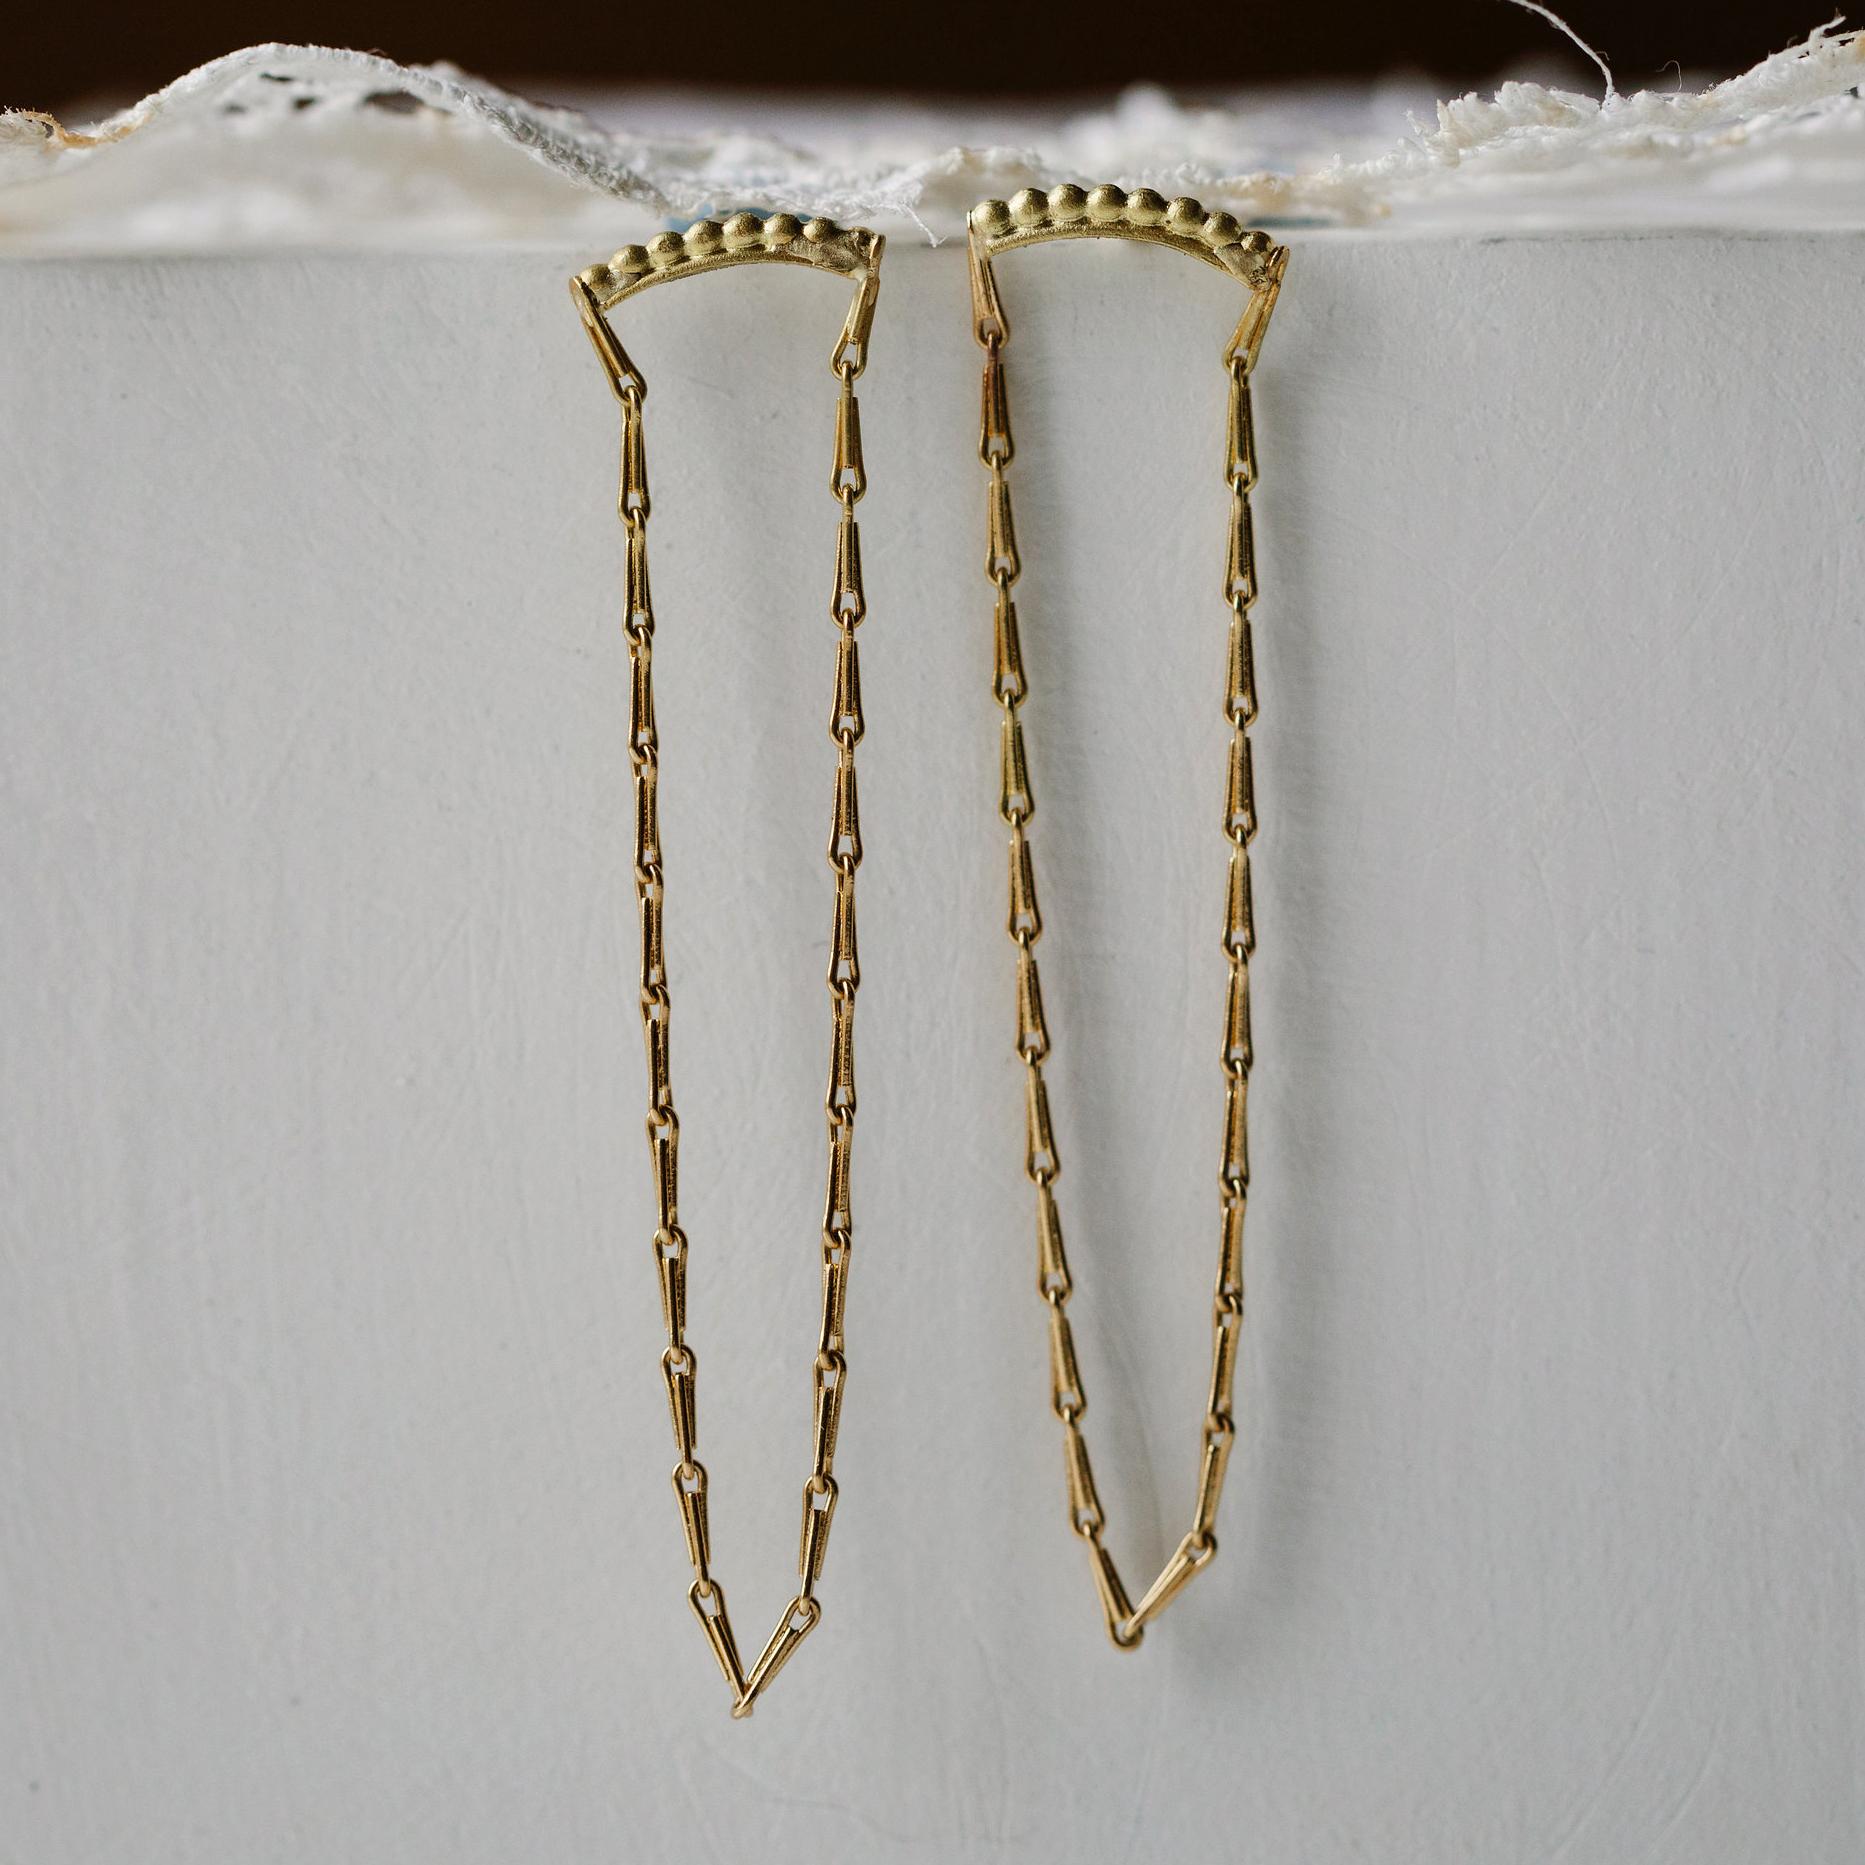 10 chain studs STYLED.jpg